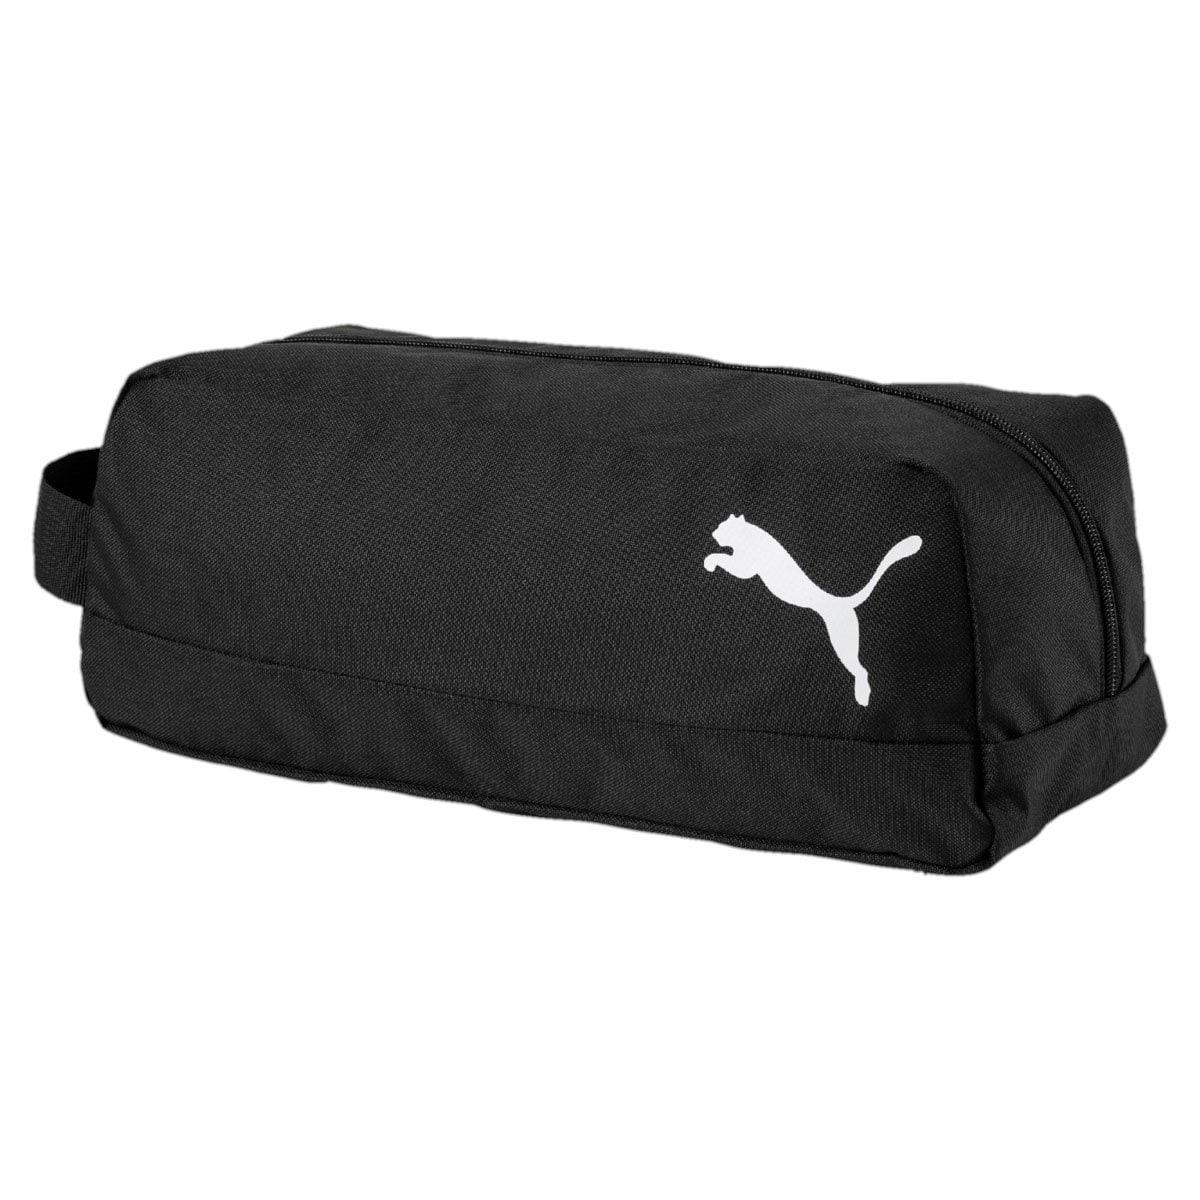 Zapatera Training Shoe Bag Puma